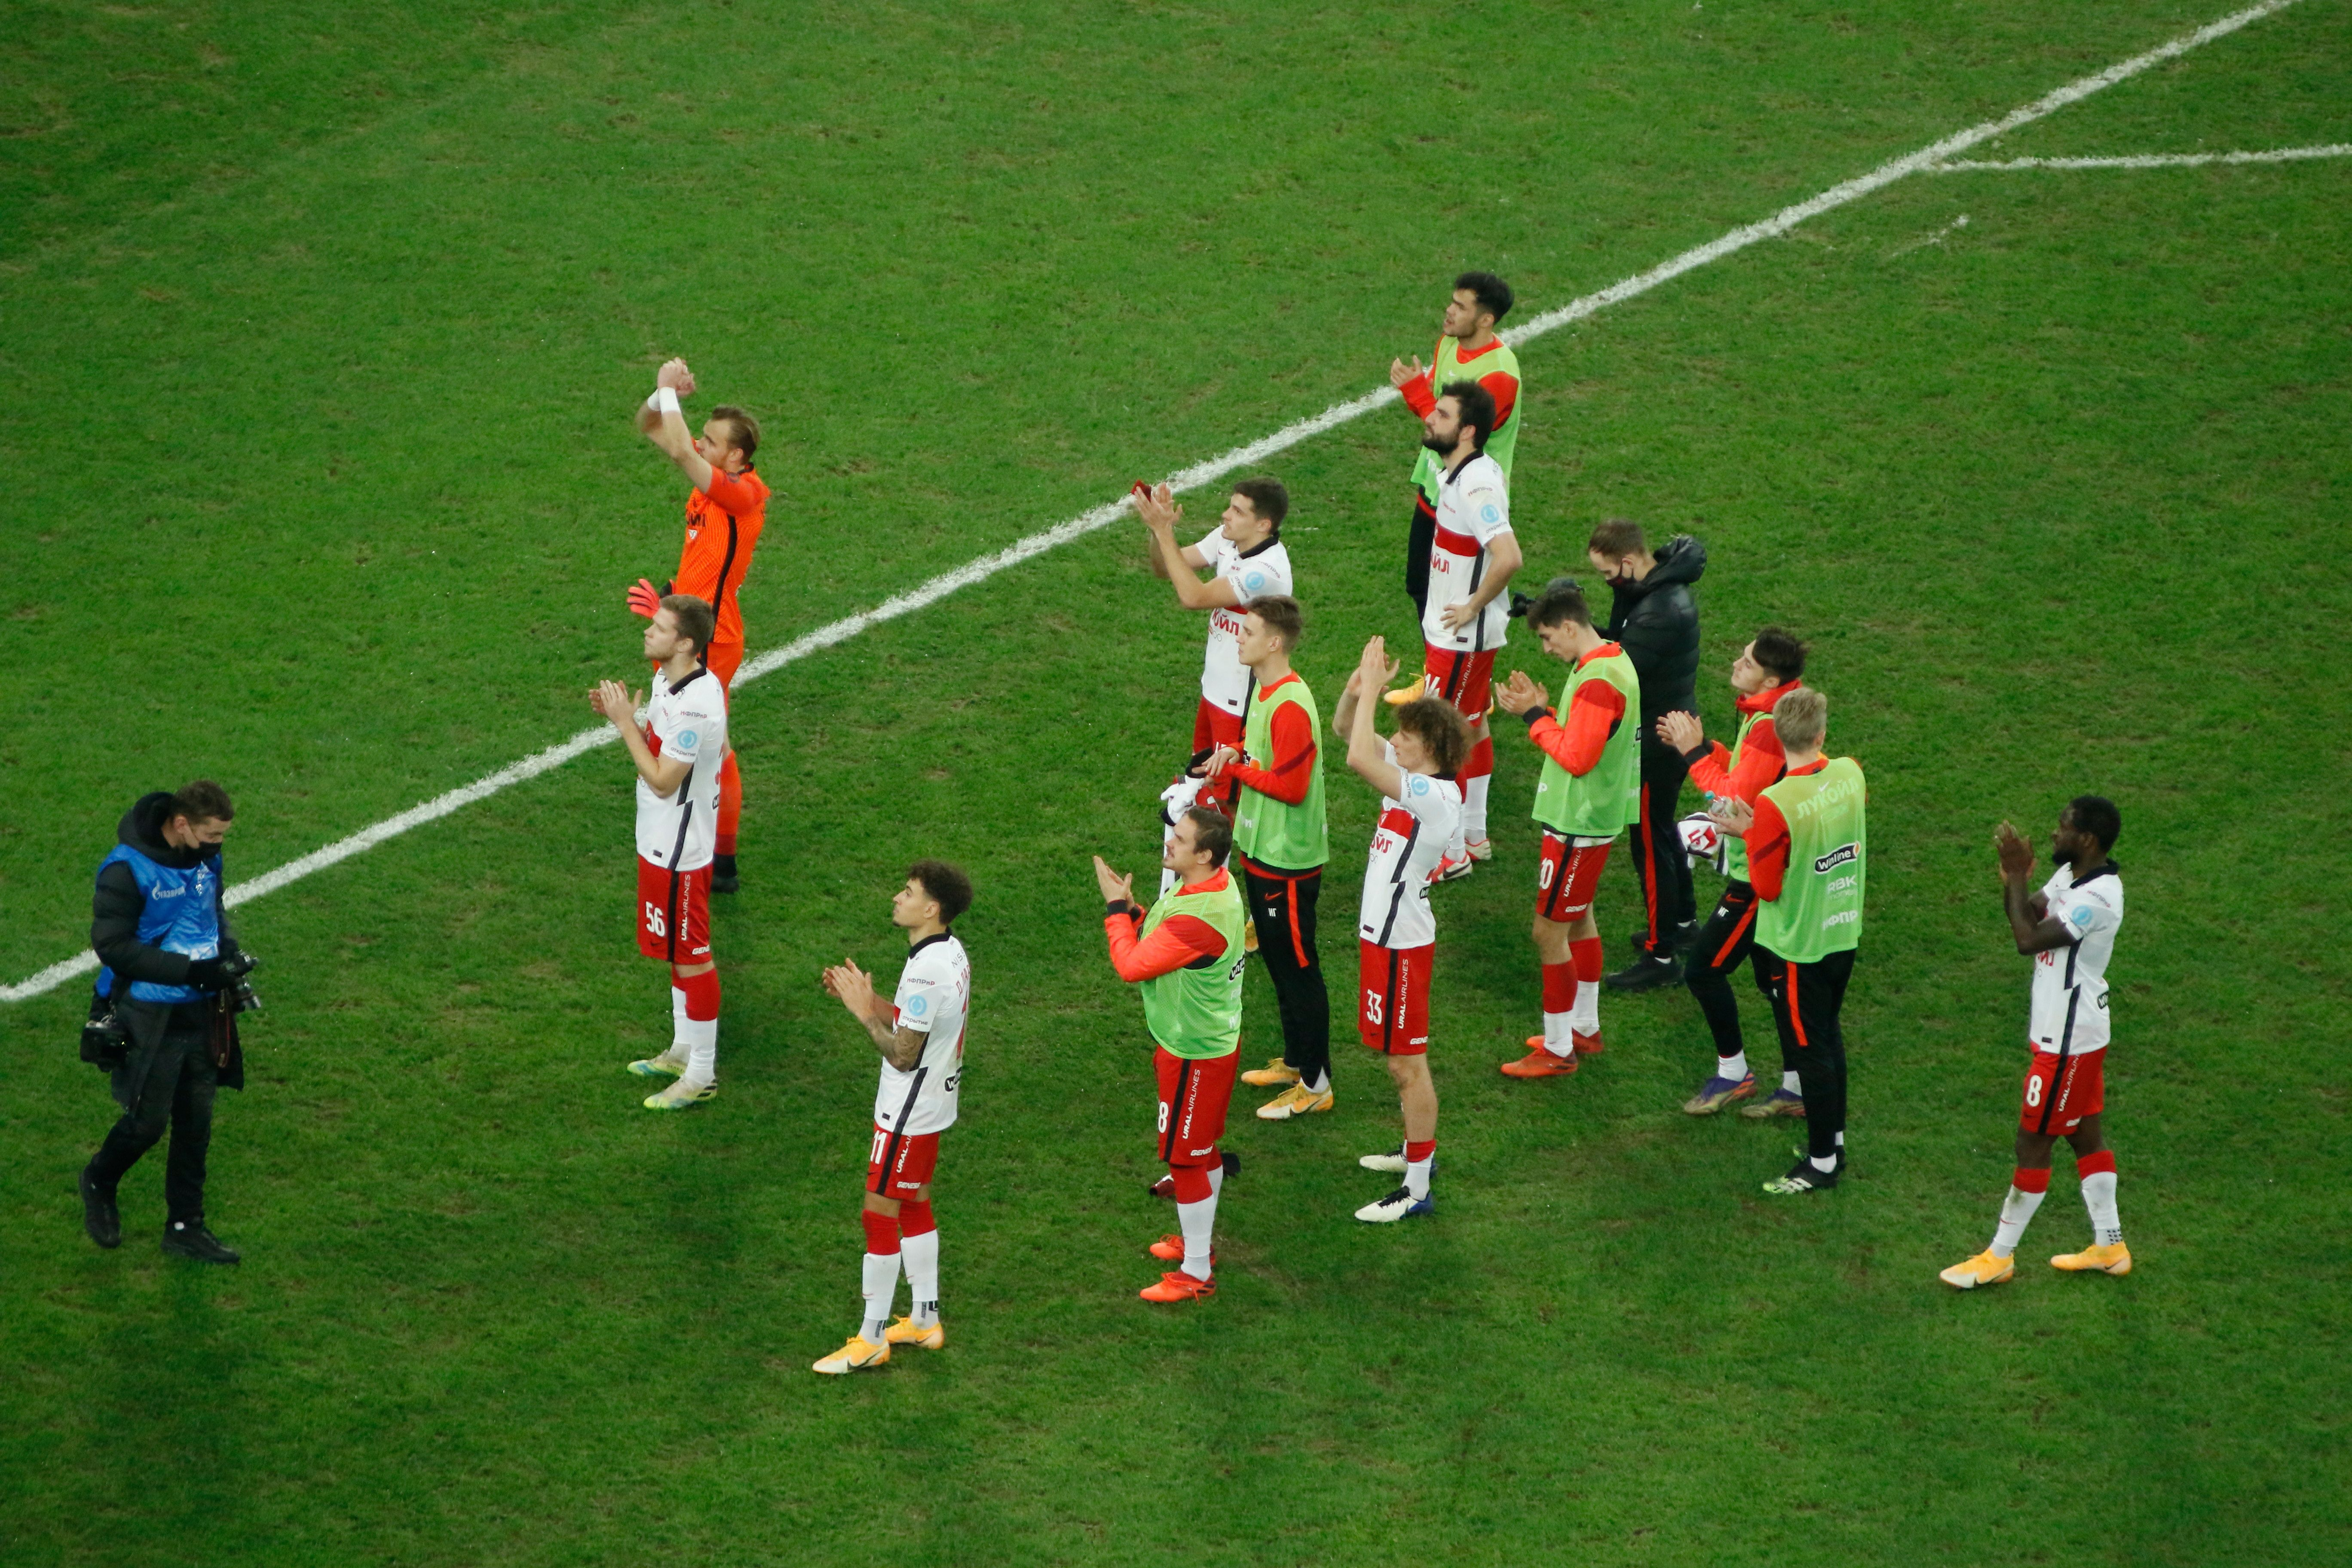 Спартак заявил Педро Рошу на оставшуюся часть сезона РПЛ